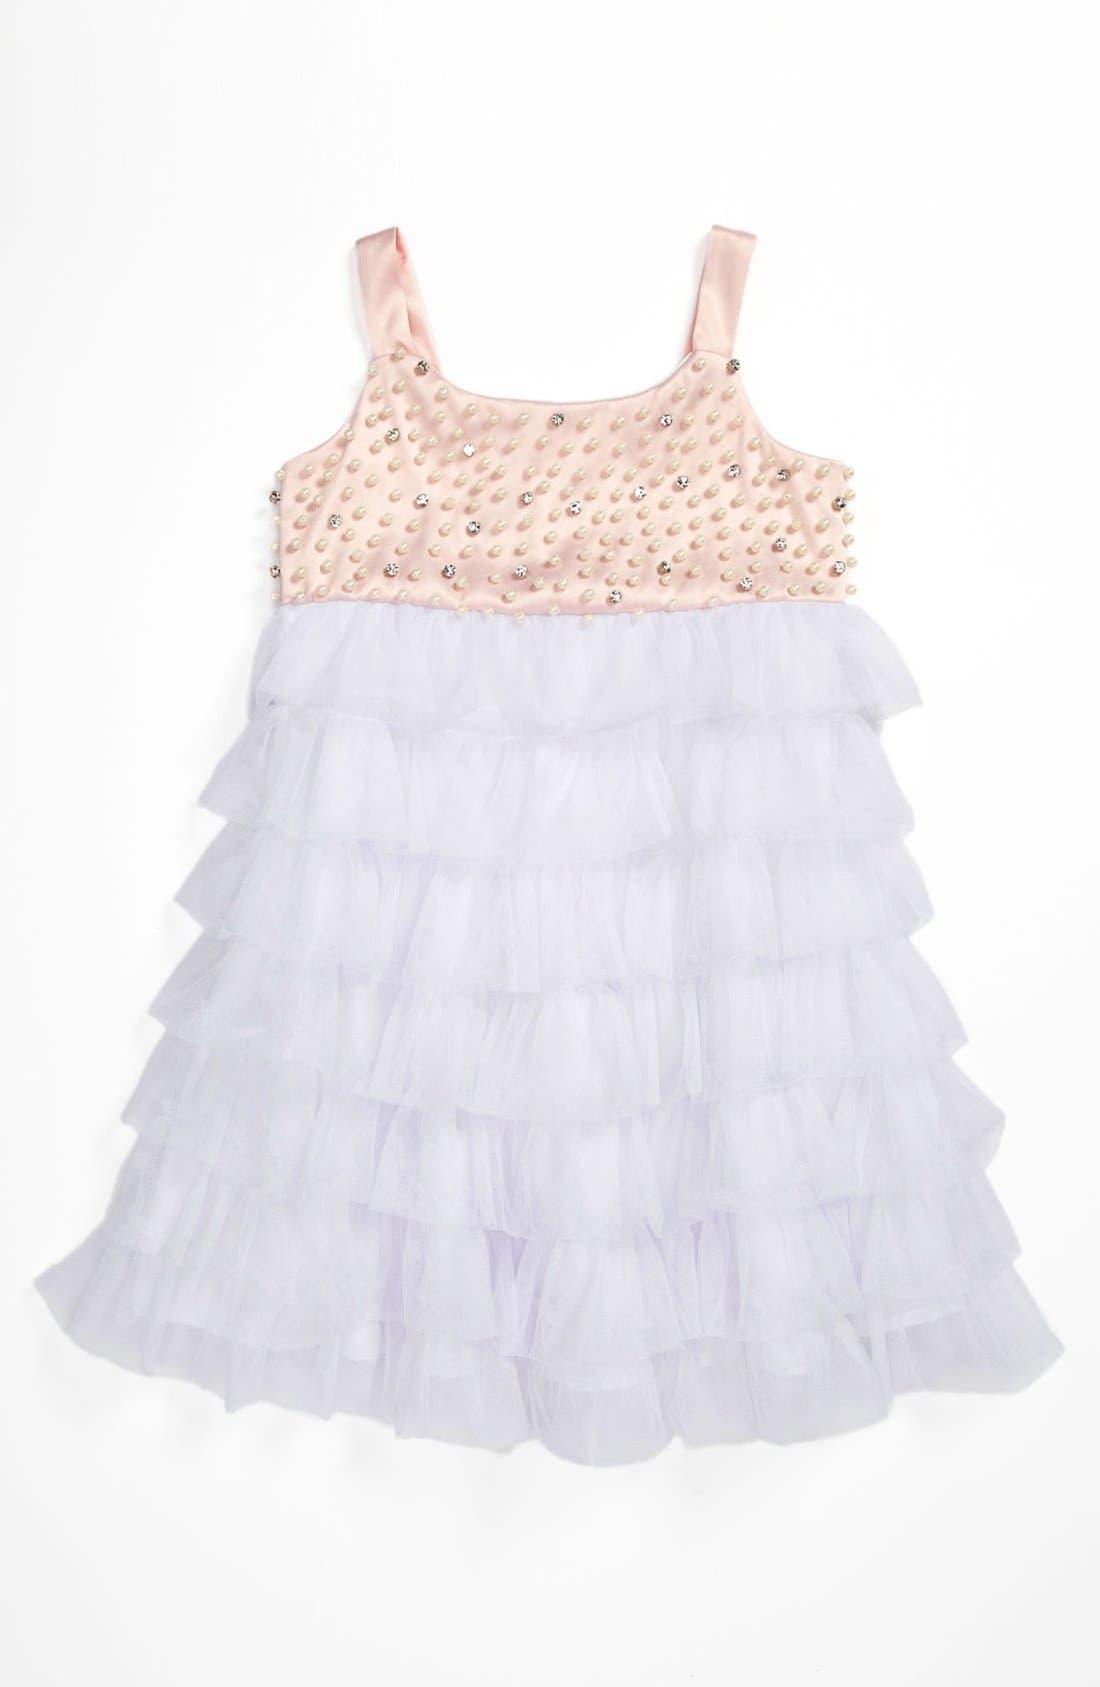 Main Image - La Piccola Danza Kidswear Beaded Bodice Dress (Little Girls)